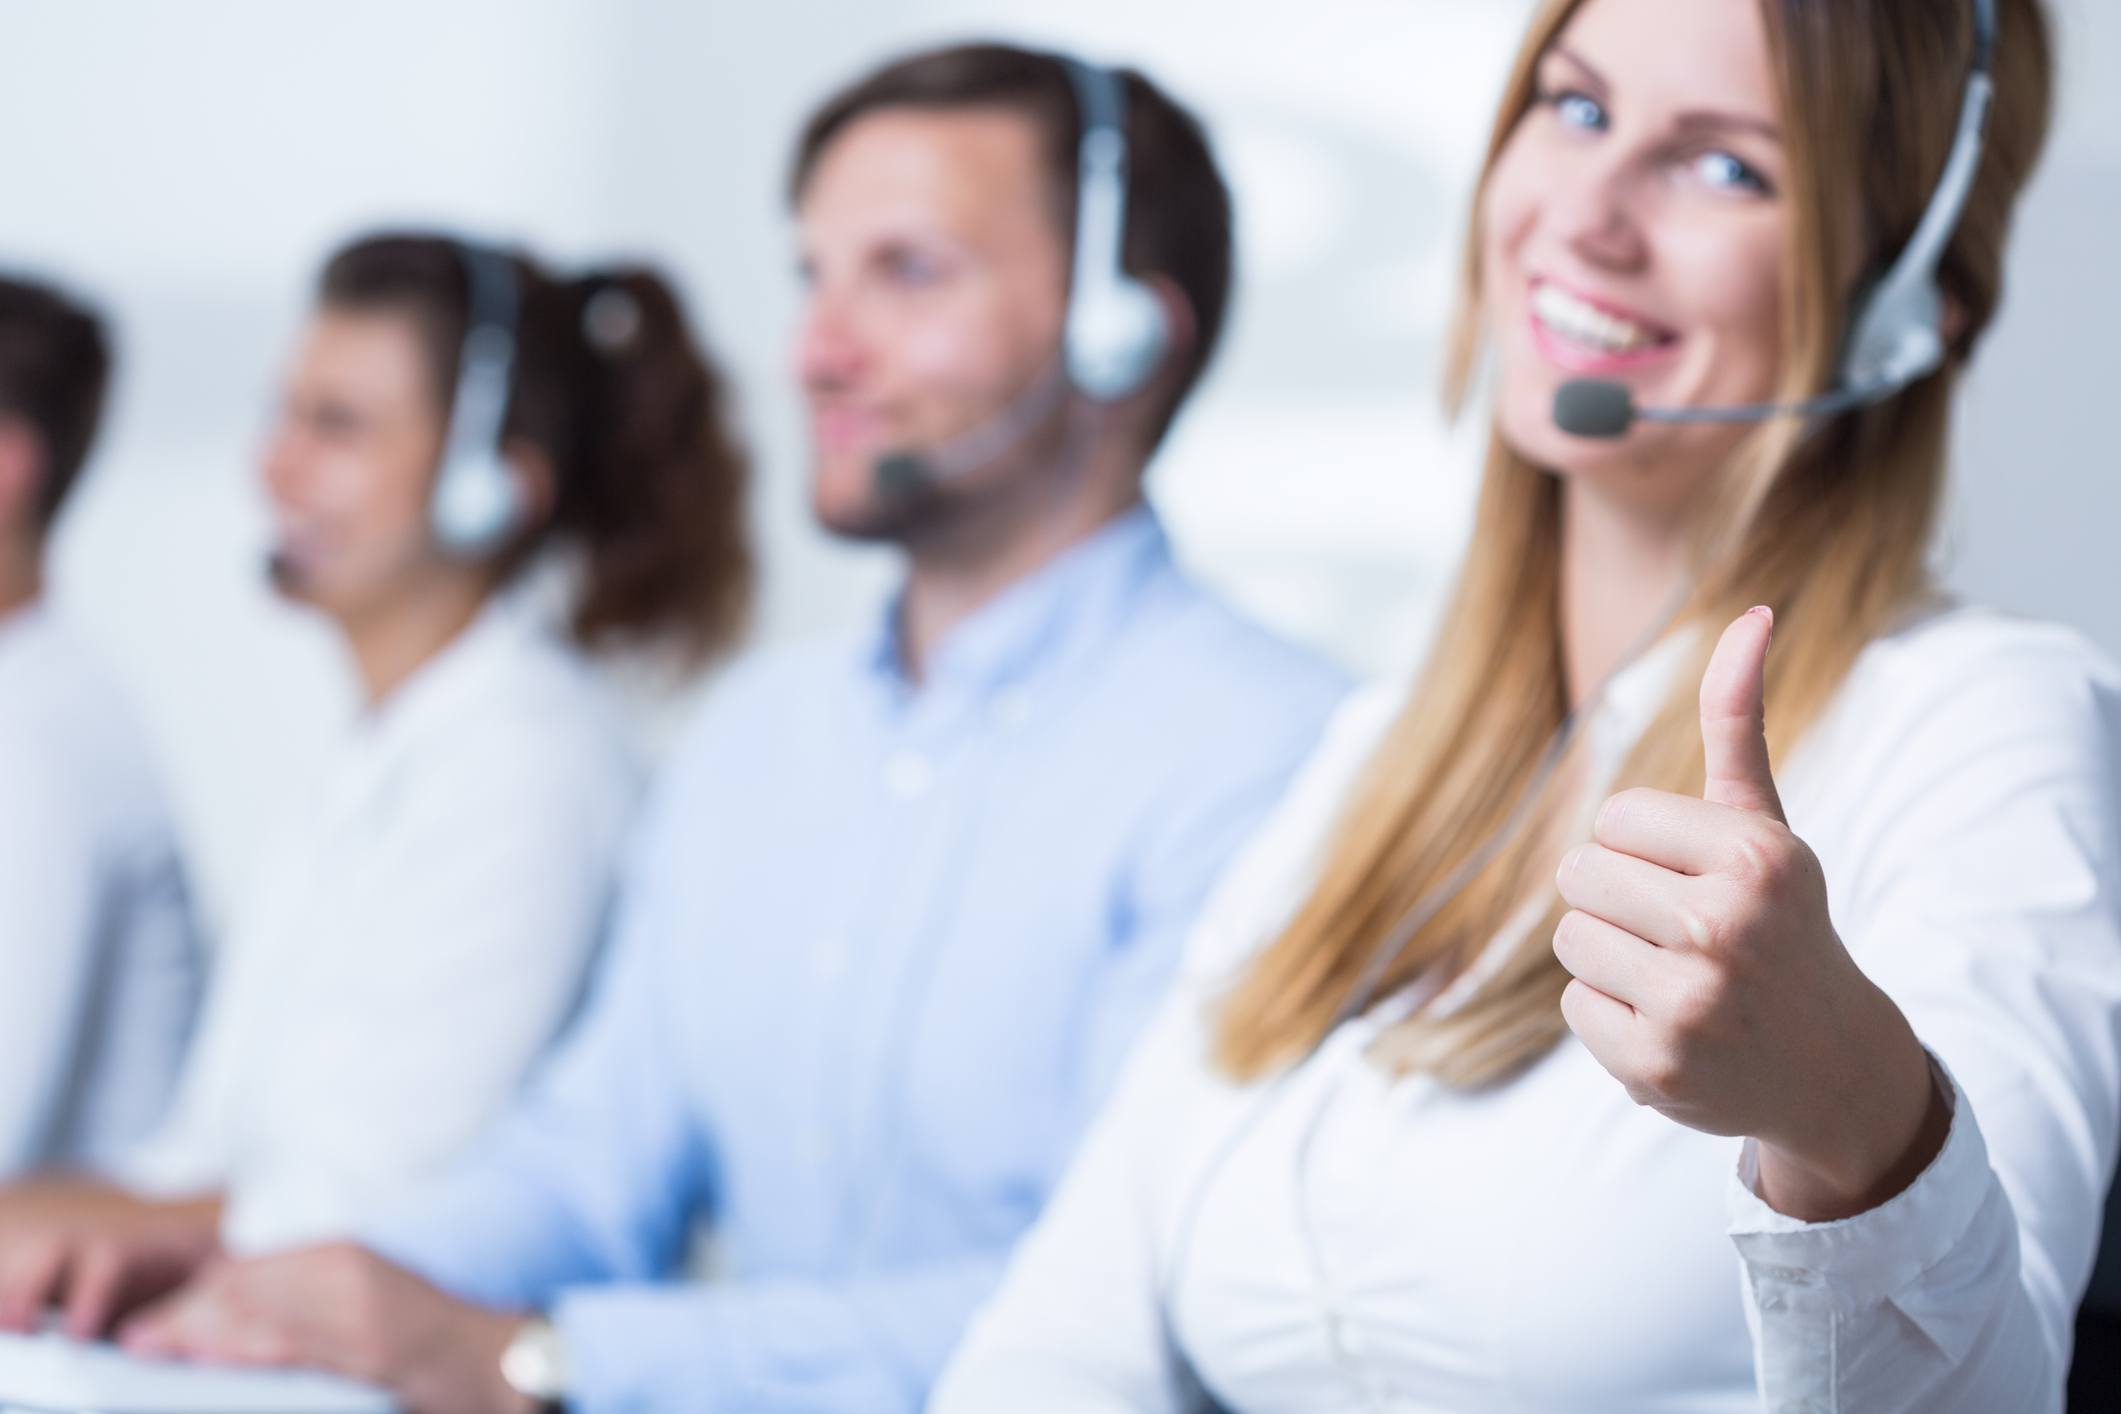 Attractive call center or customer service operator